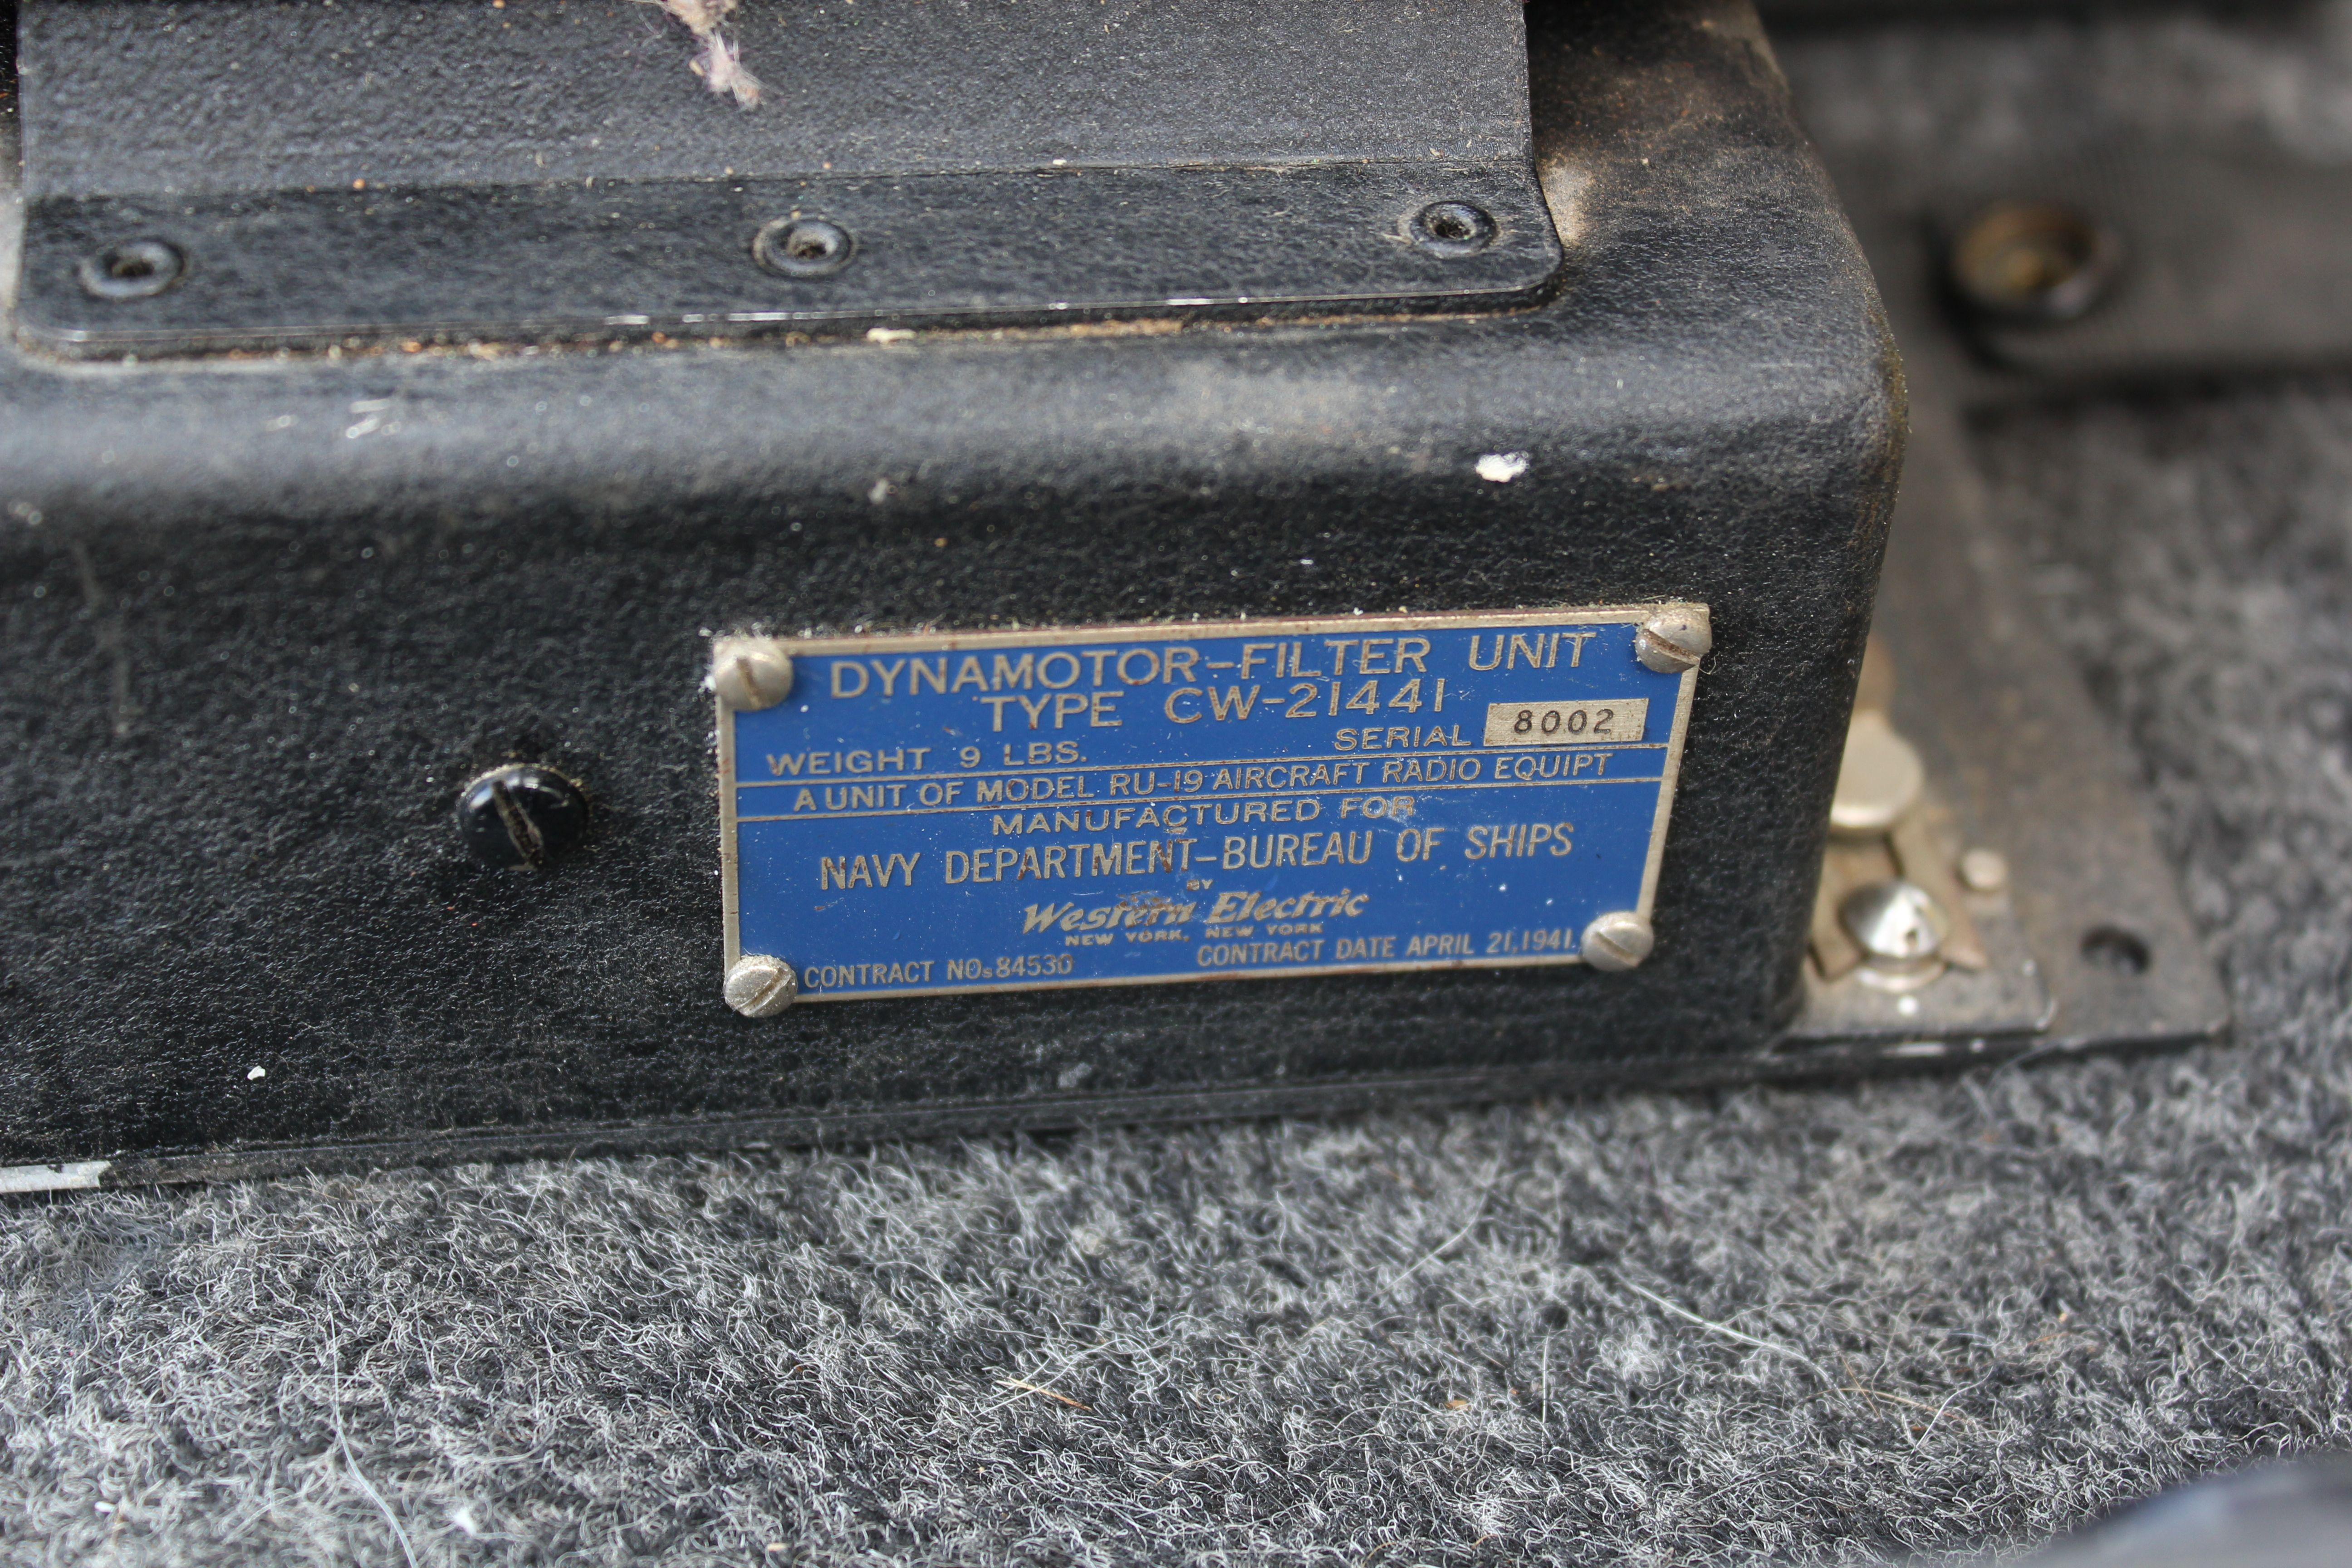 Dynamotor Base Dataplate